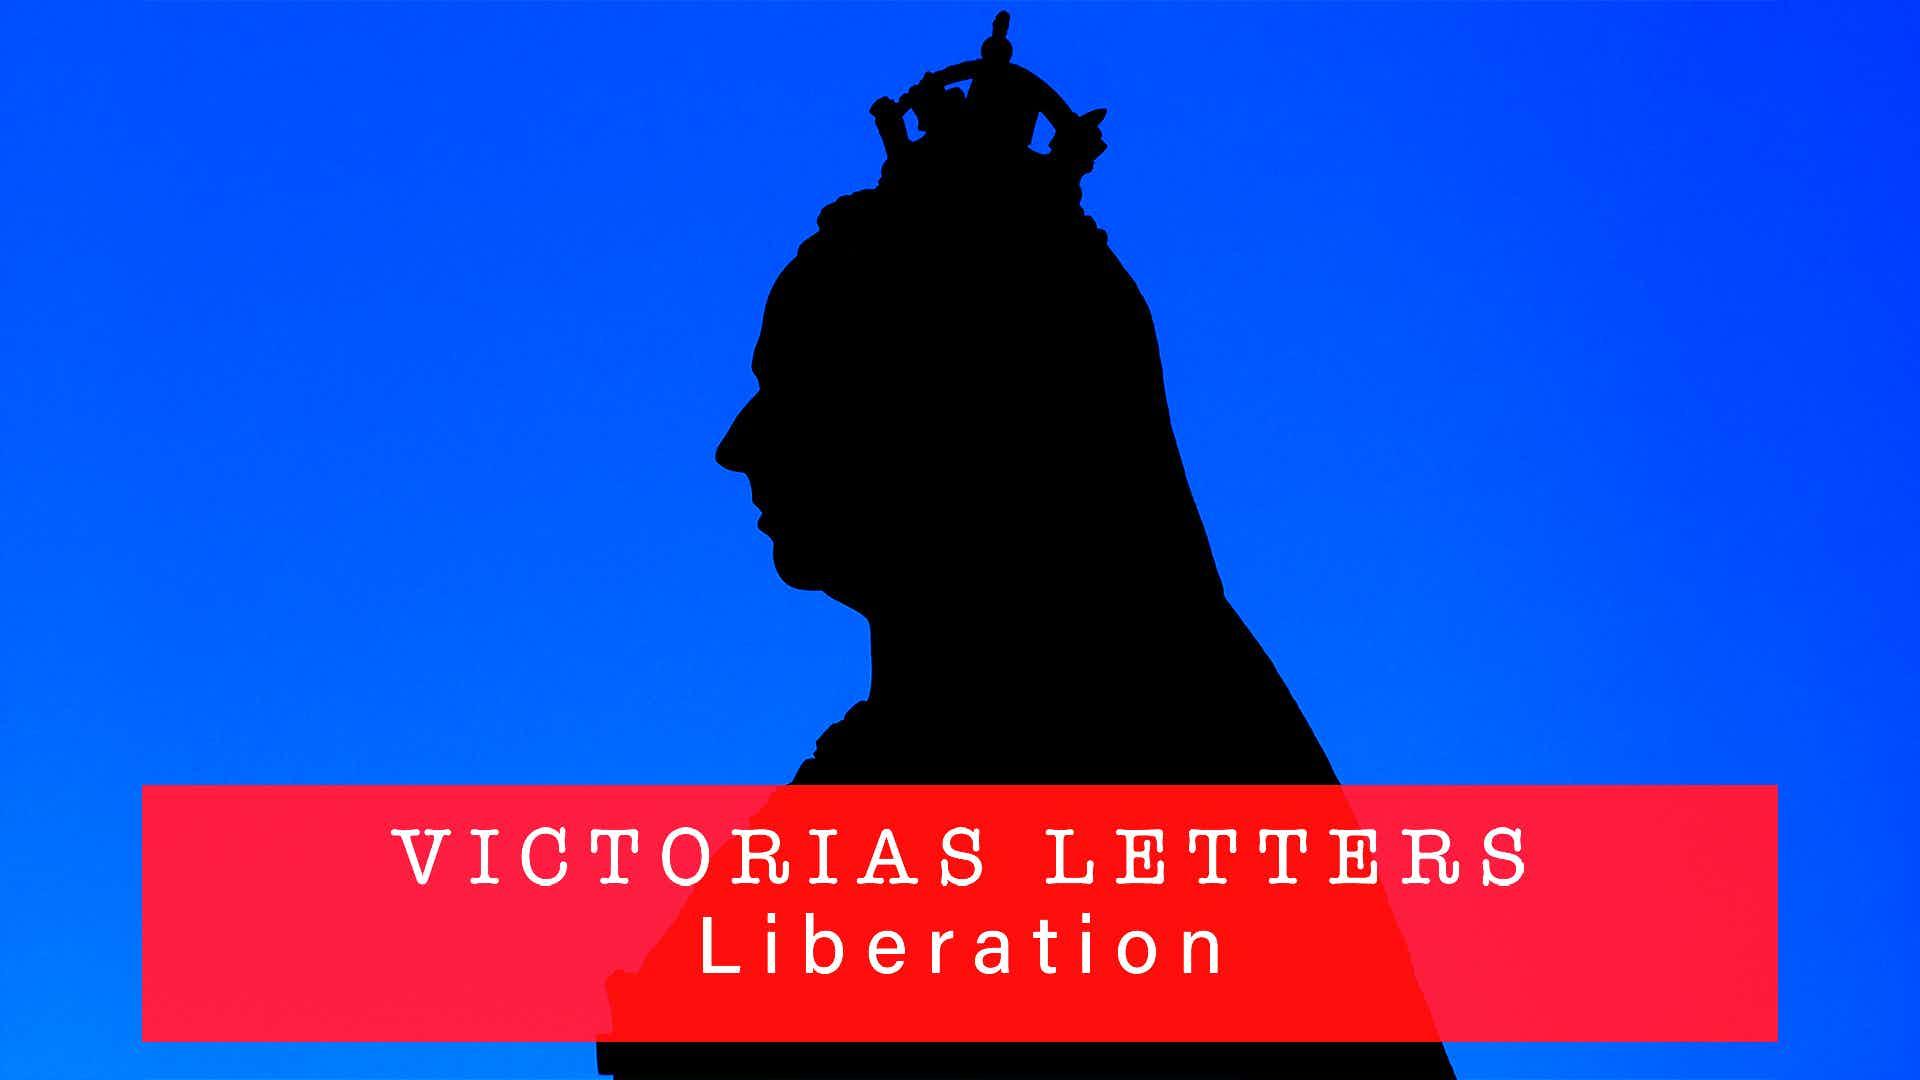 Victoria's Letters: Liberation